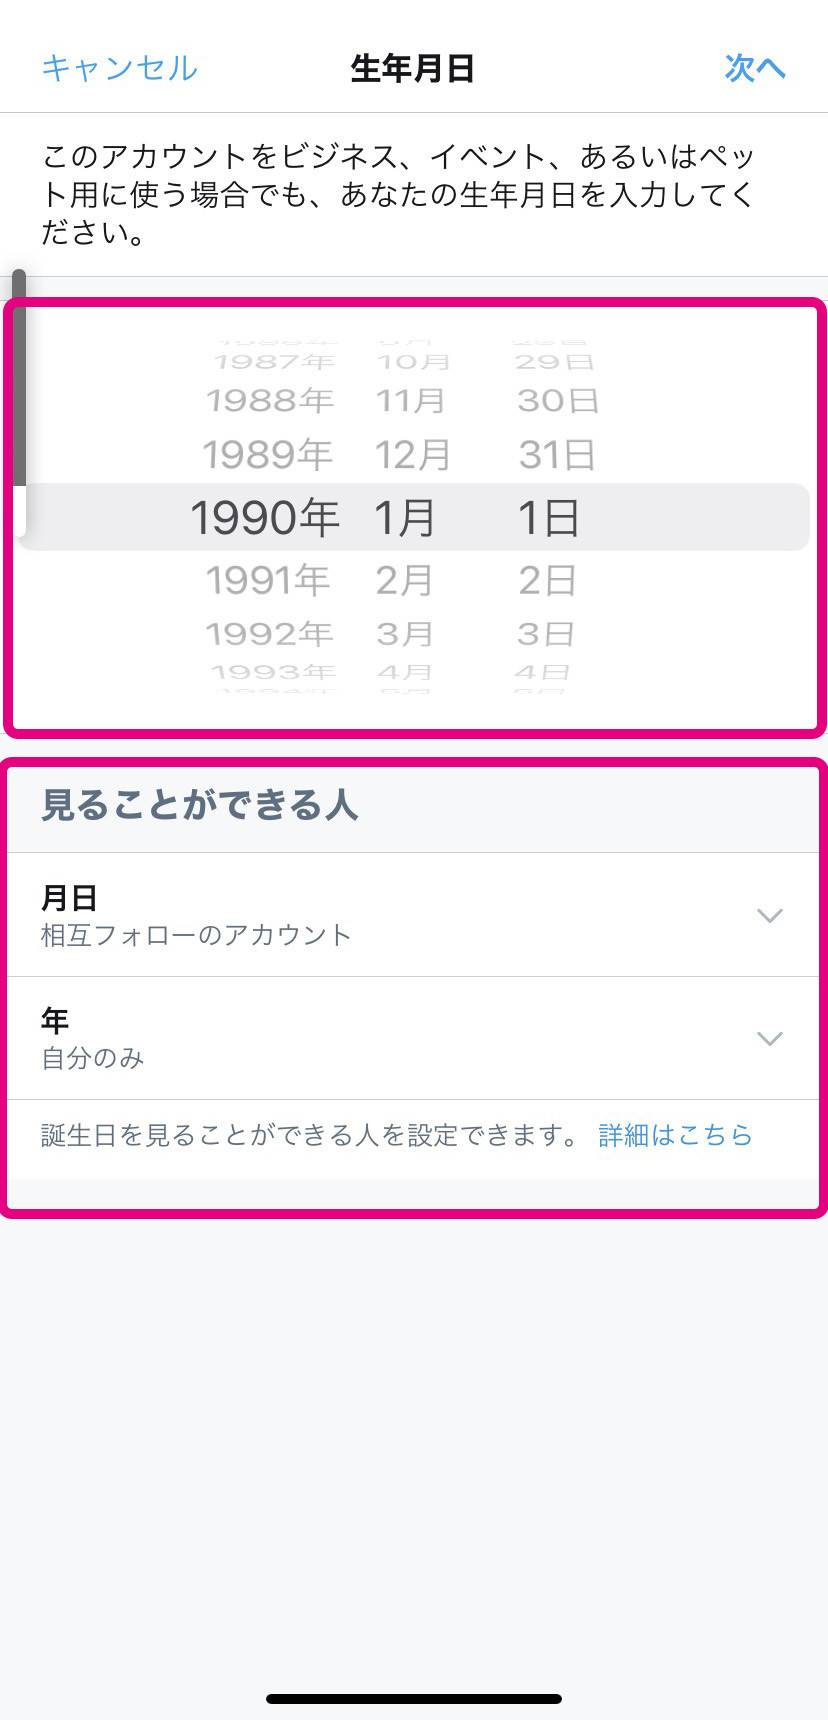 Twitter誕生日:誕生日の設定3